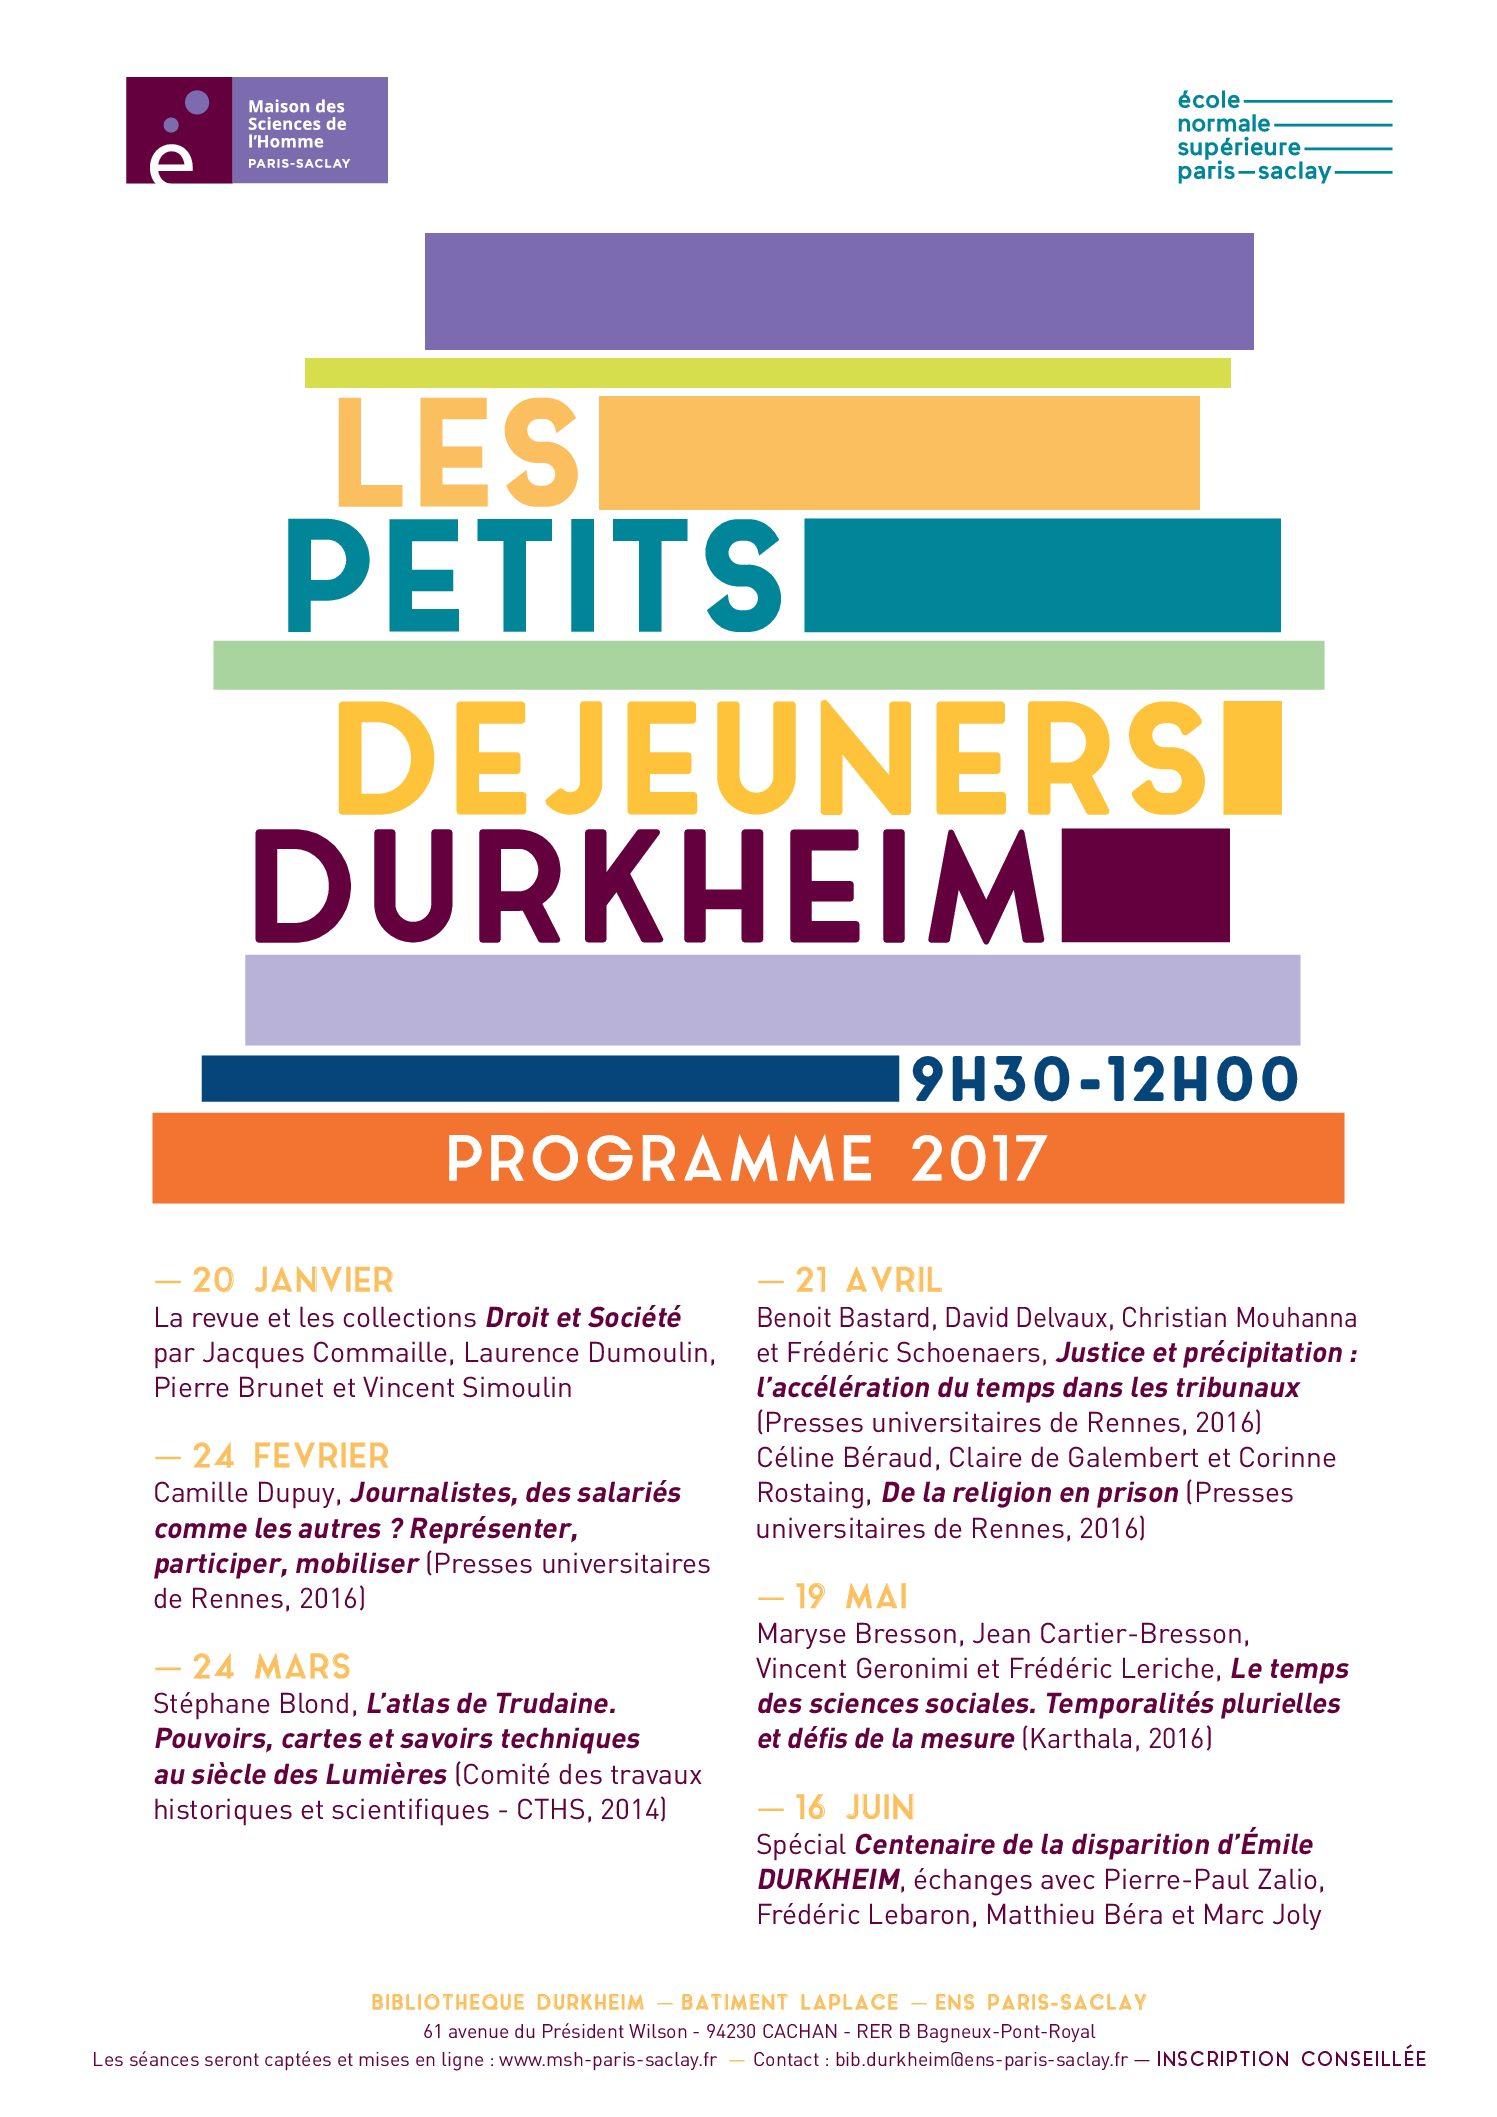 Petits déjeuners Durkheim – 16/06/2017